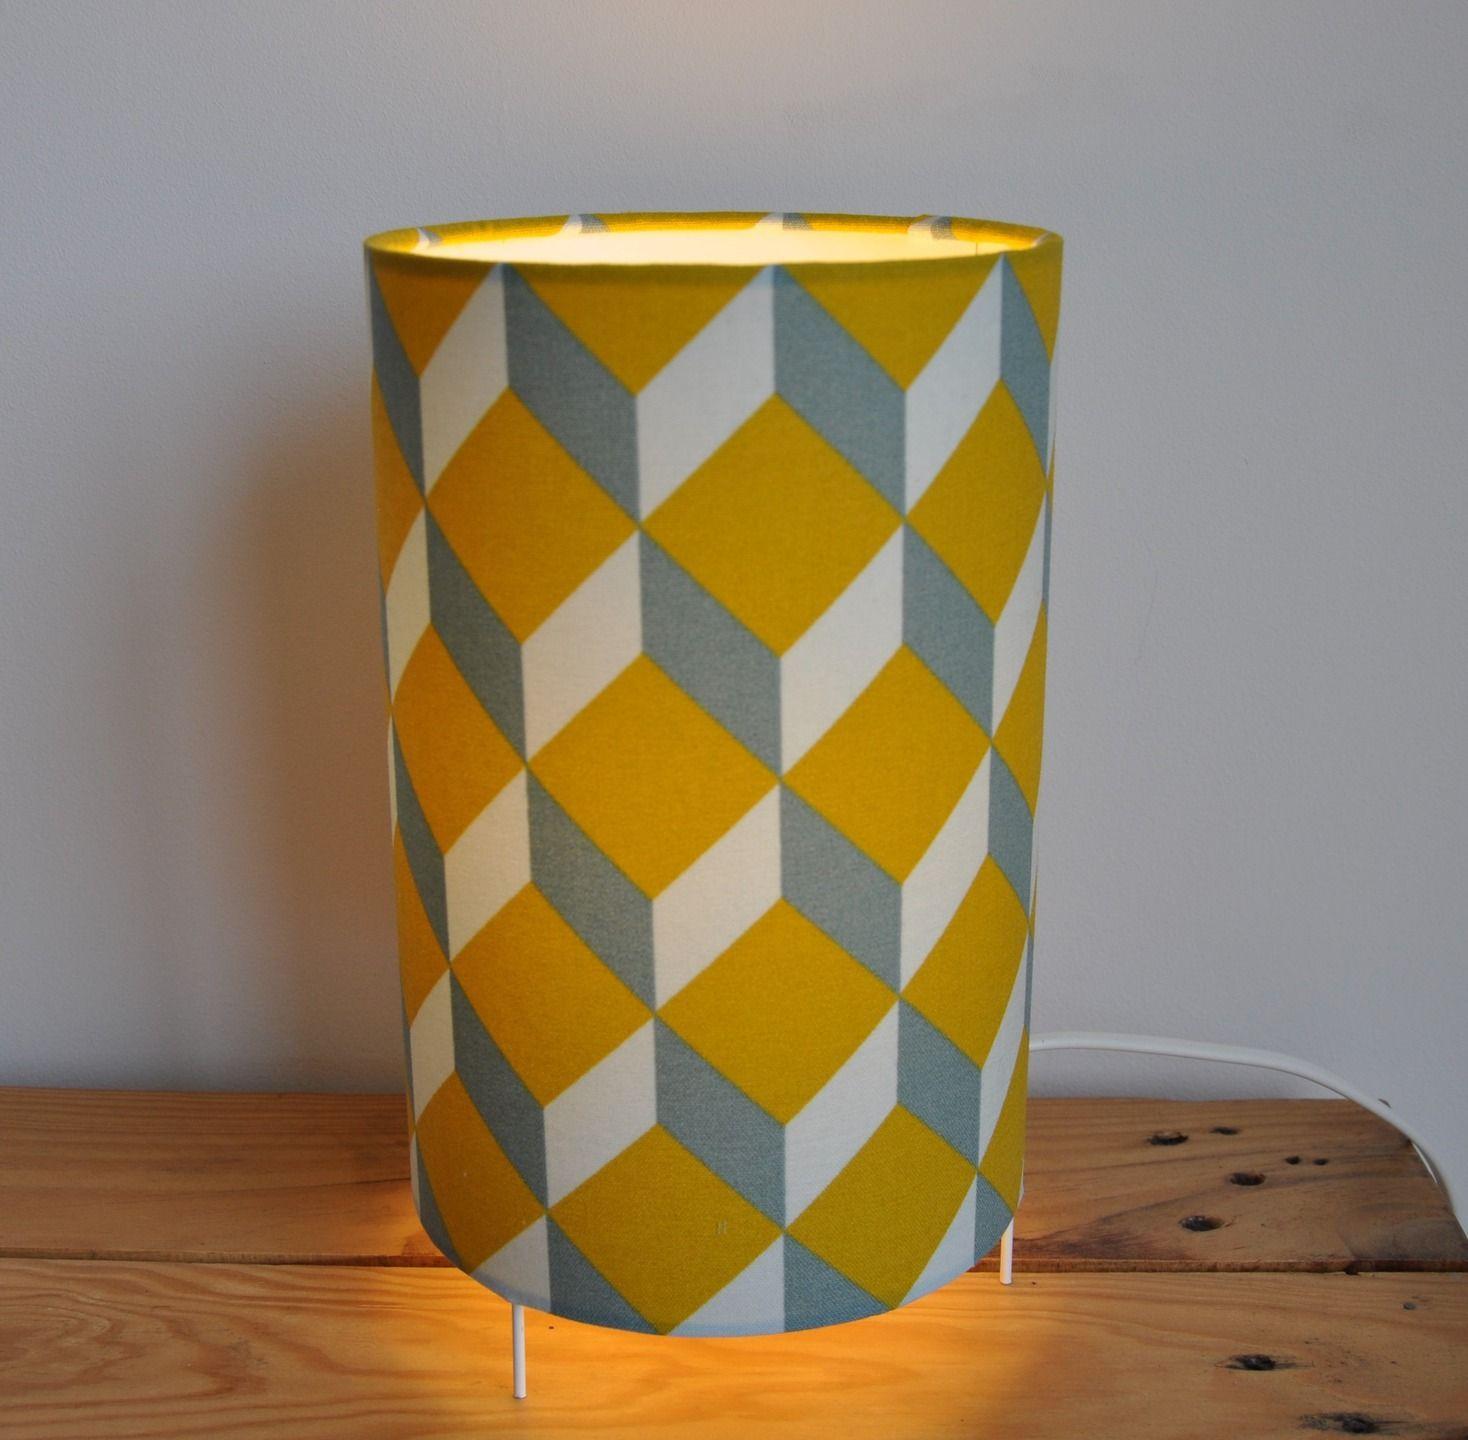 Lampe Style Scandinave Tissu Cube Moutarde Bleu Girs Lampe A